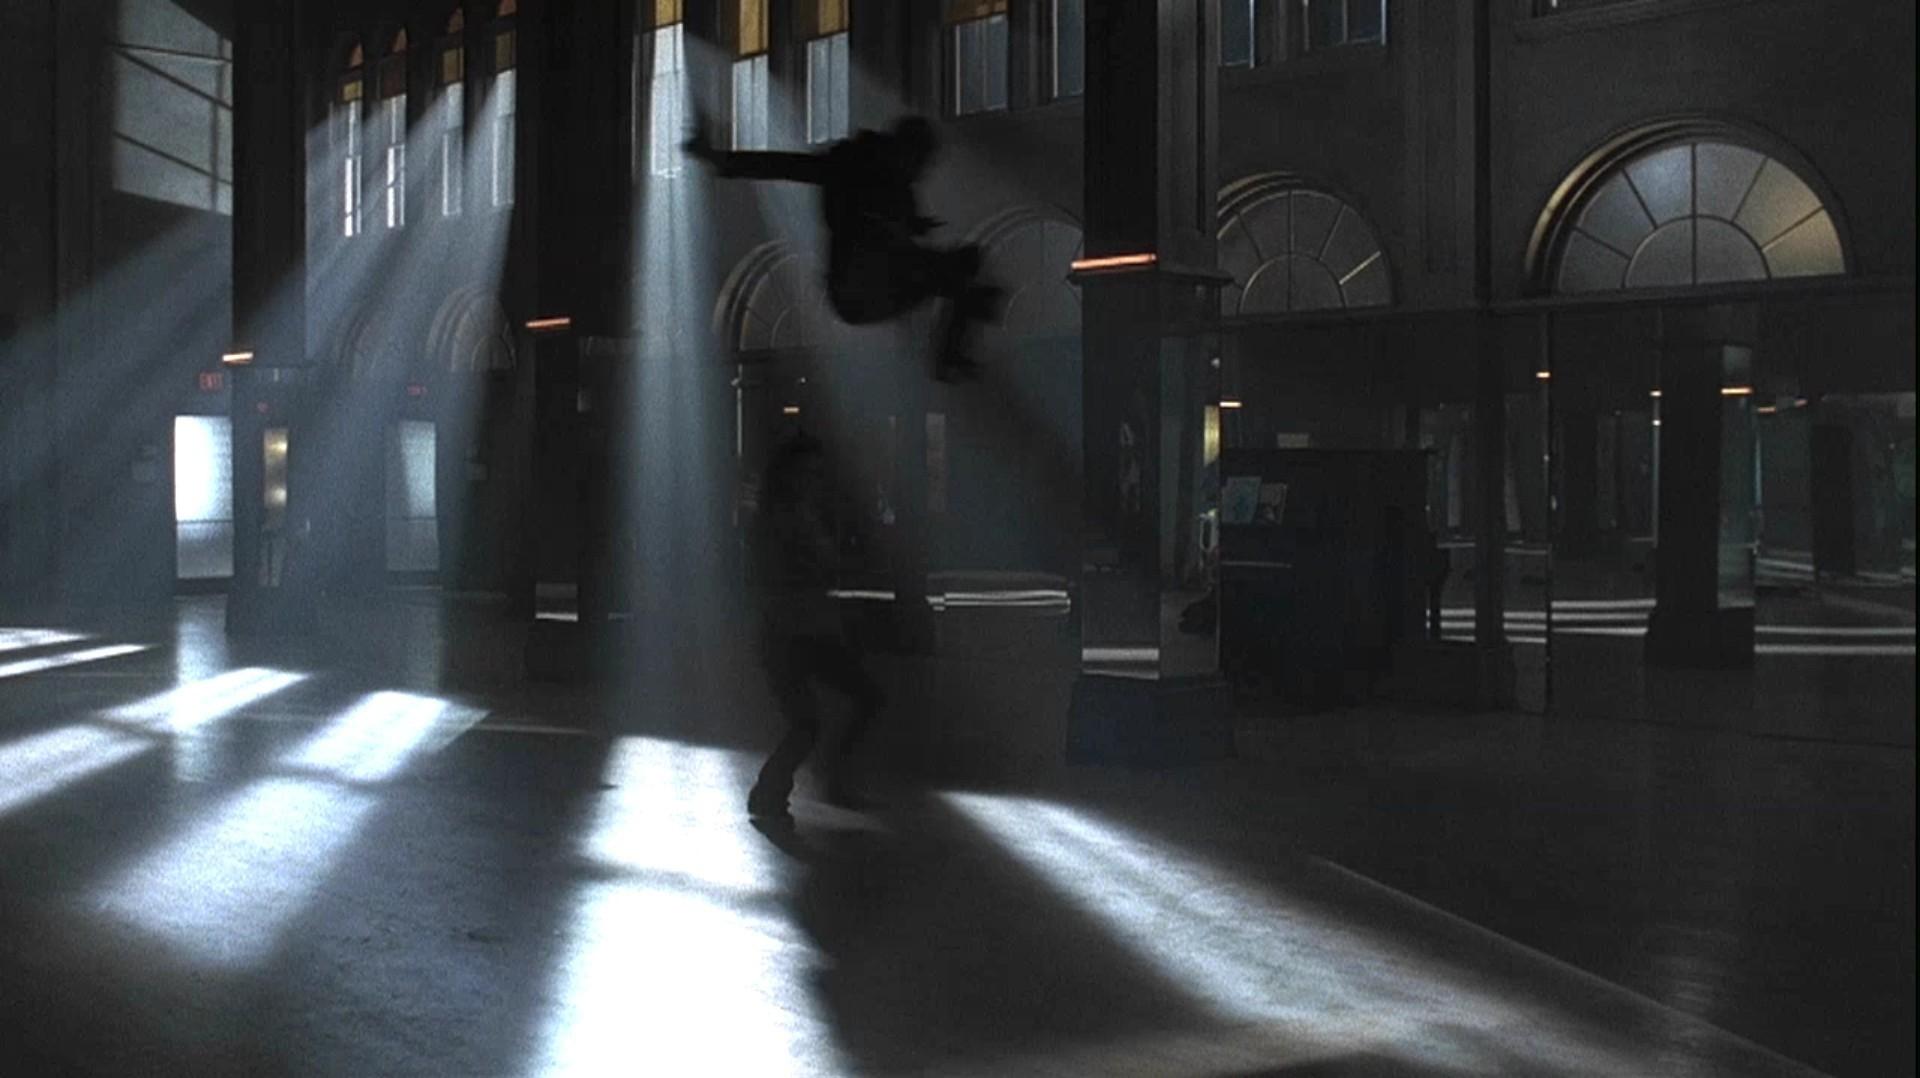 studios scenes